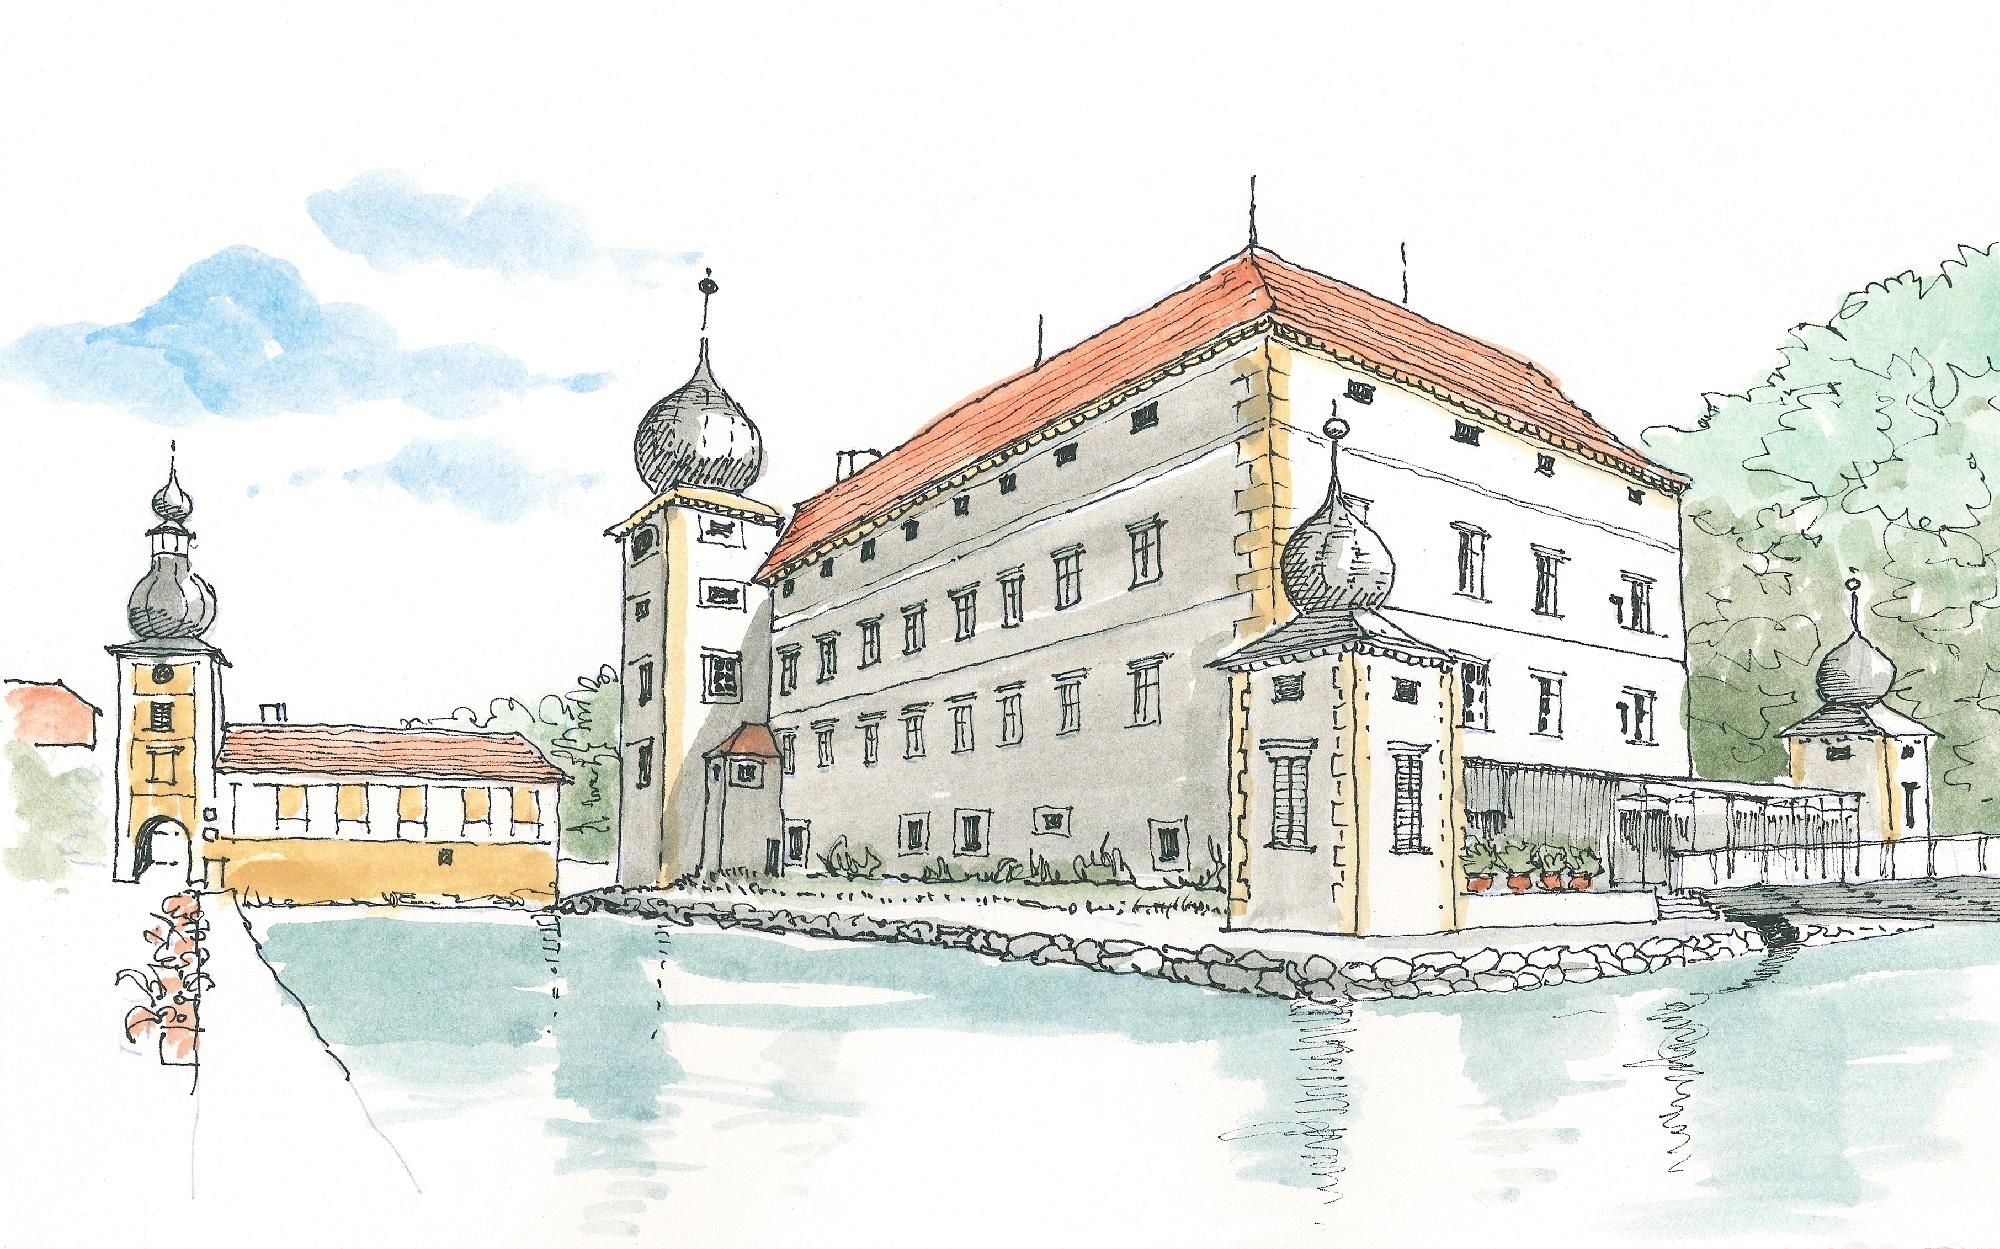 Exhibition at Kottingbrunn castle